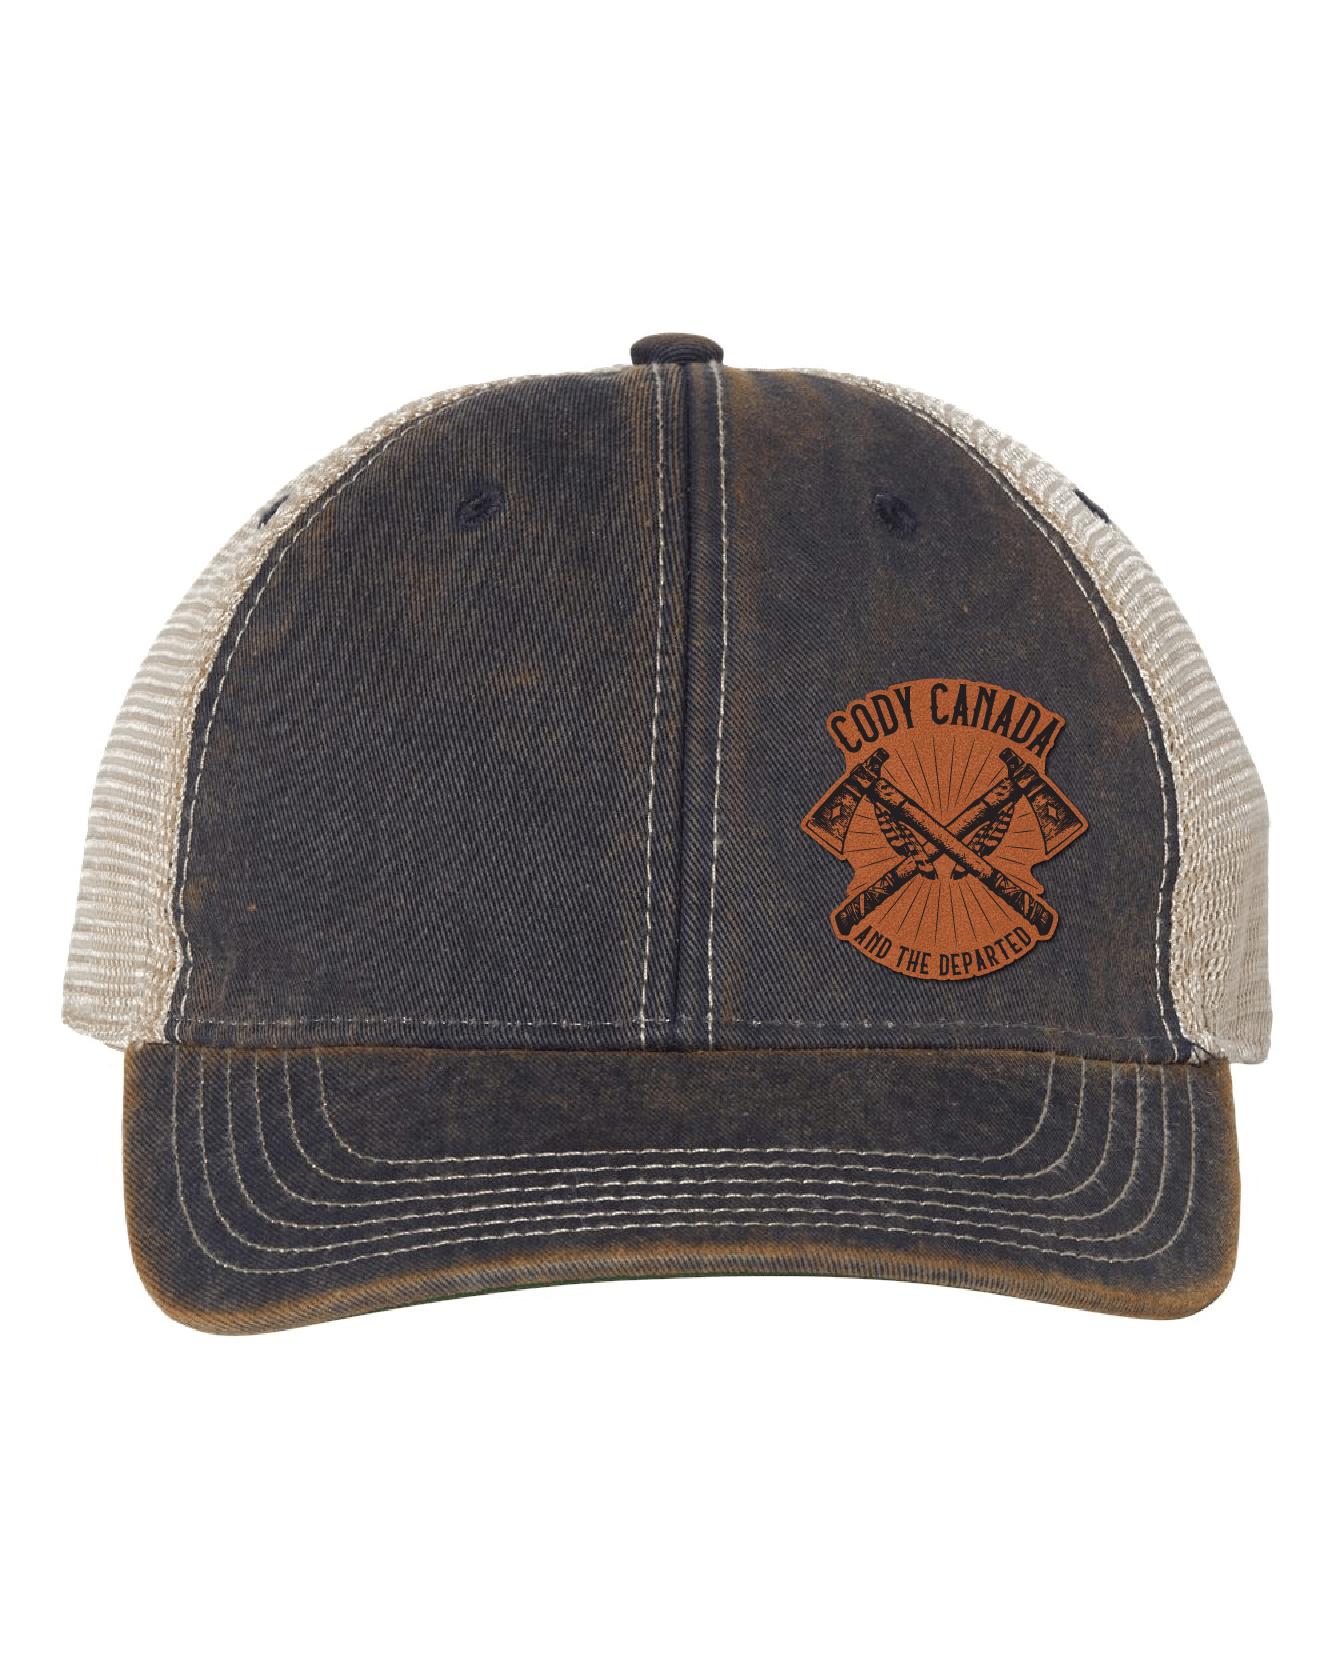 Image of Tomahawk Hat